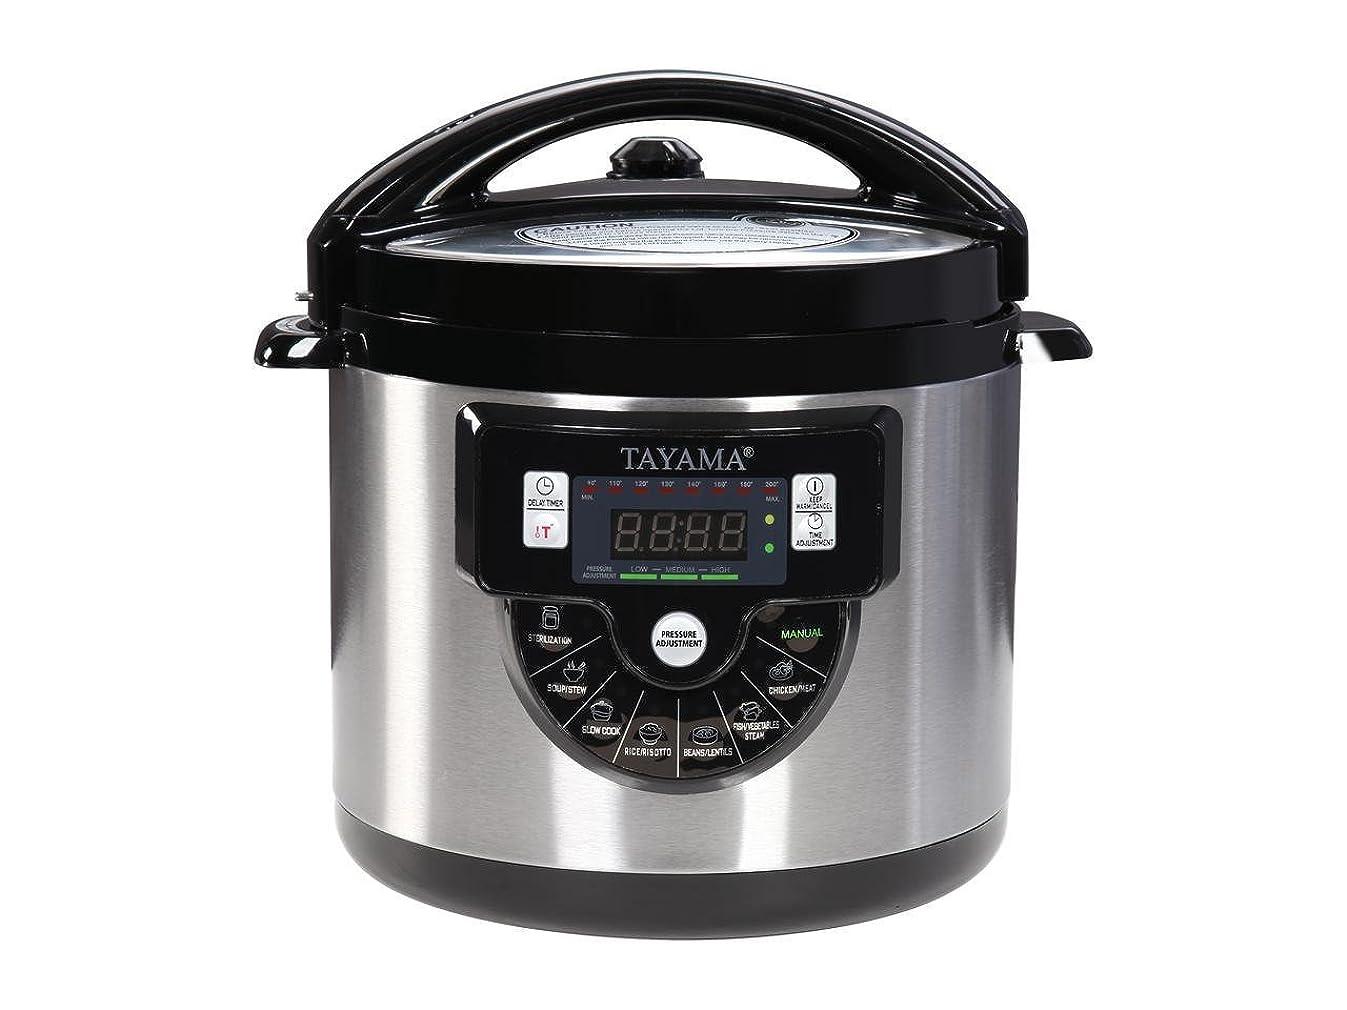 Tayama TMC-60XL 6 Quart 8 in 1 Multi Function Pressure Cooker, 6 Qt, Black